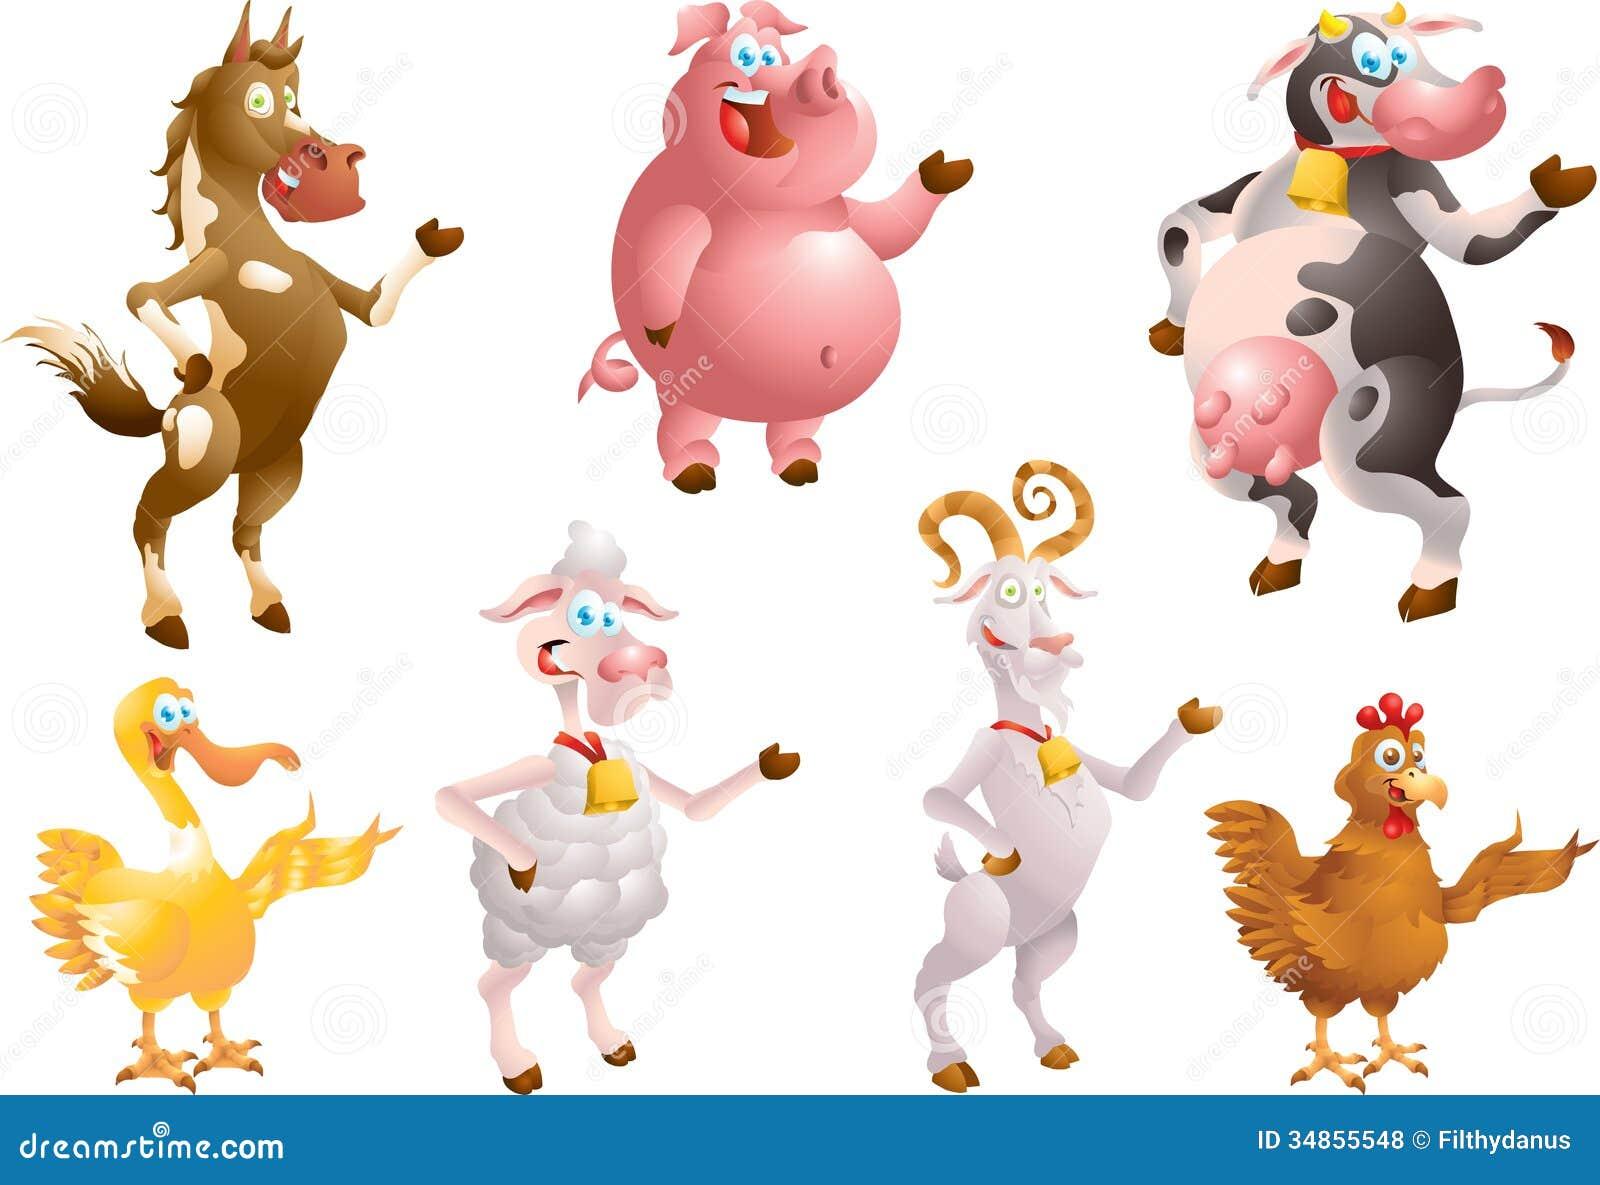 Farm animals stock illustration. Image of hoof, cheerful ...